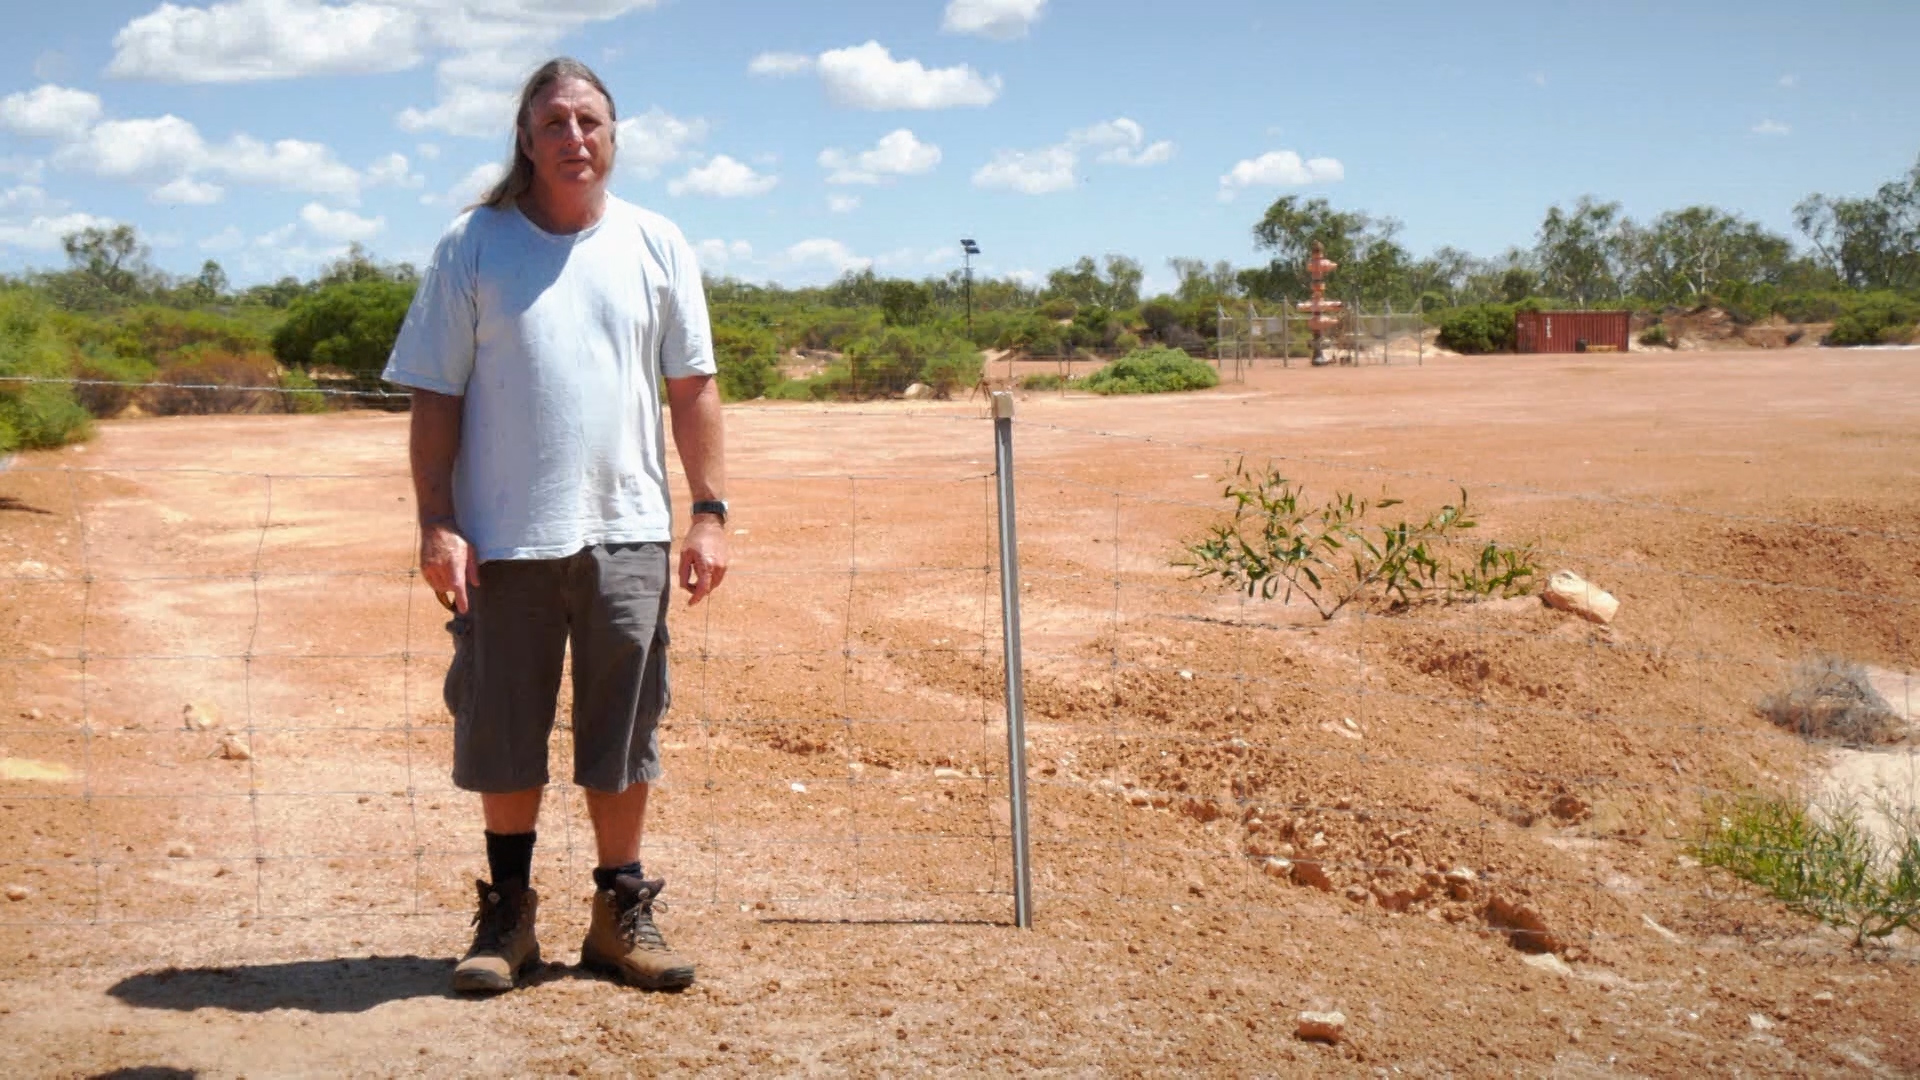 Kimberley Fracking Microdoc_Metro_Full_h264.mp4.00_00_17_06.Still001.jpg